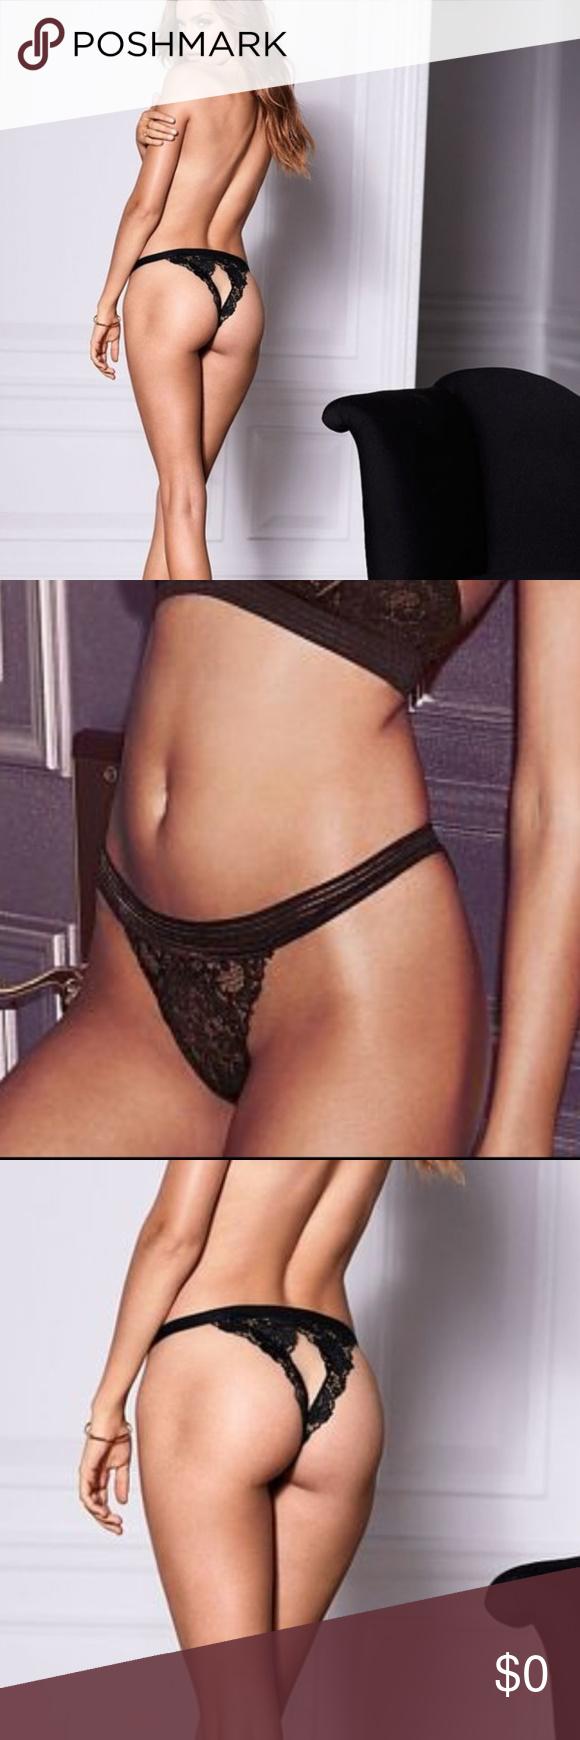 bdb3edb1bb36 Victoria's Secret Very Sexy Peek-a-boo Cheekini NWT!! Victoria's Secret Very